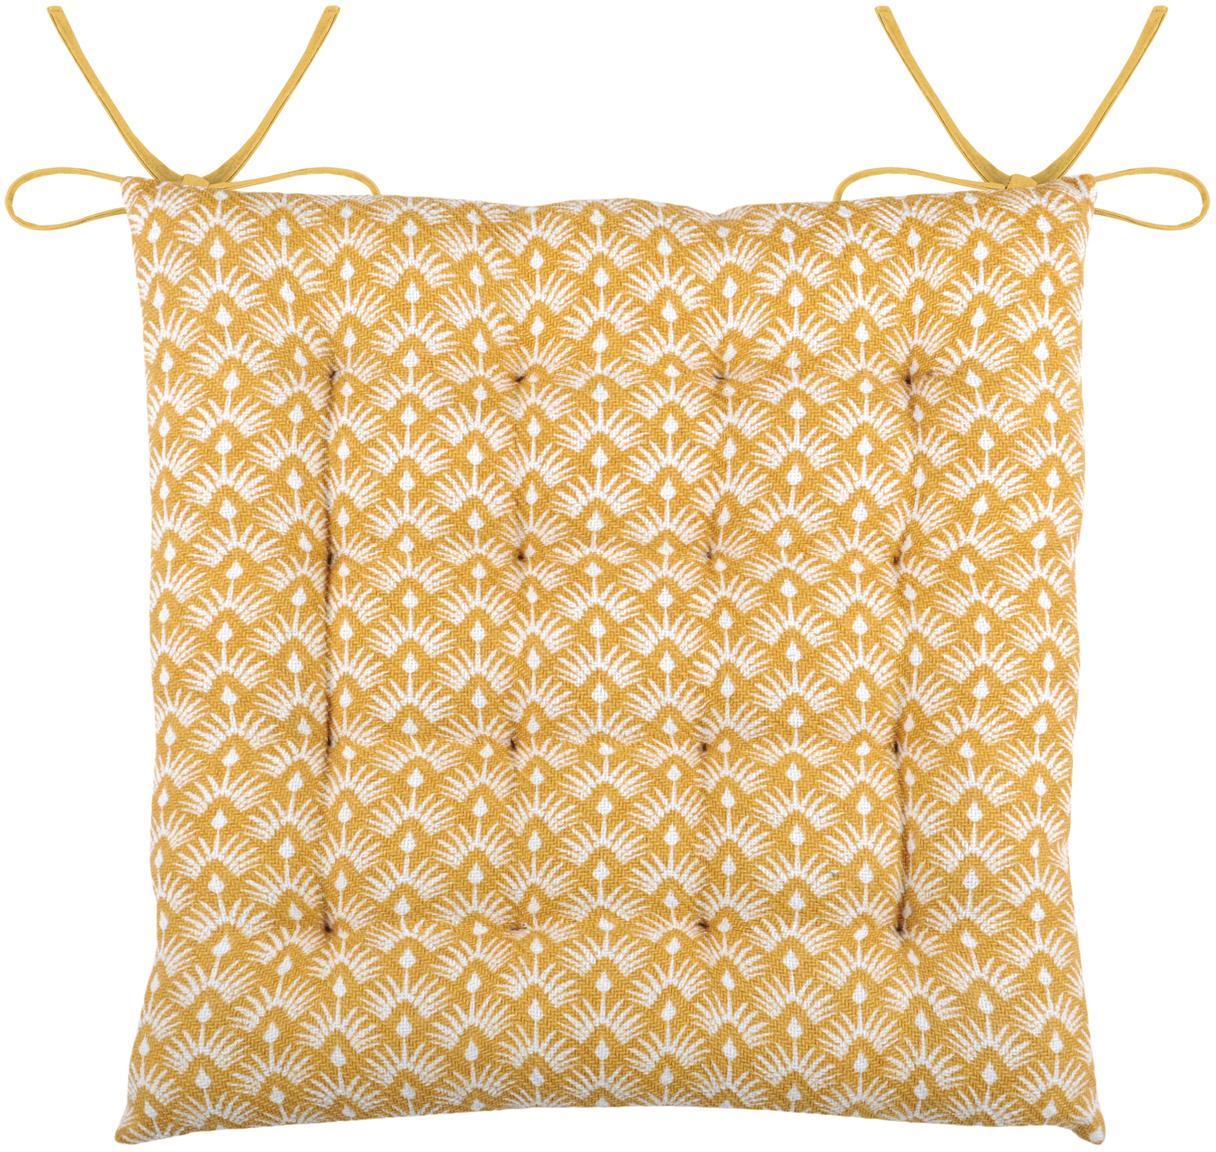 Cuscino sedia reversibile Palma, Giallo senape, bianco, Larg. 40 x Lung. 40 cm